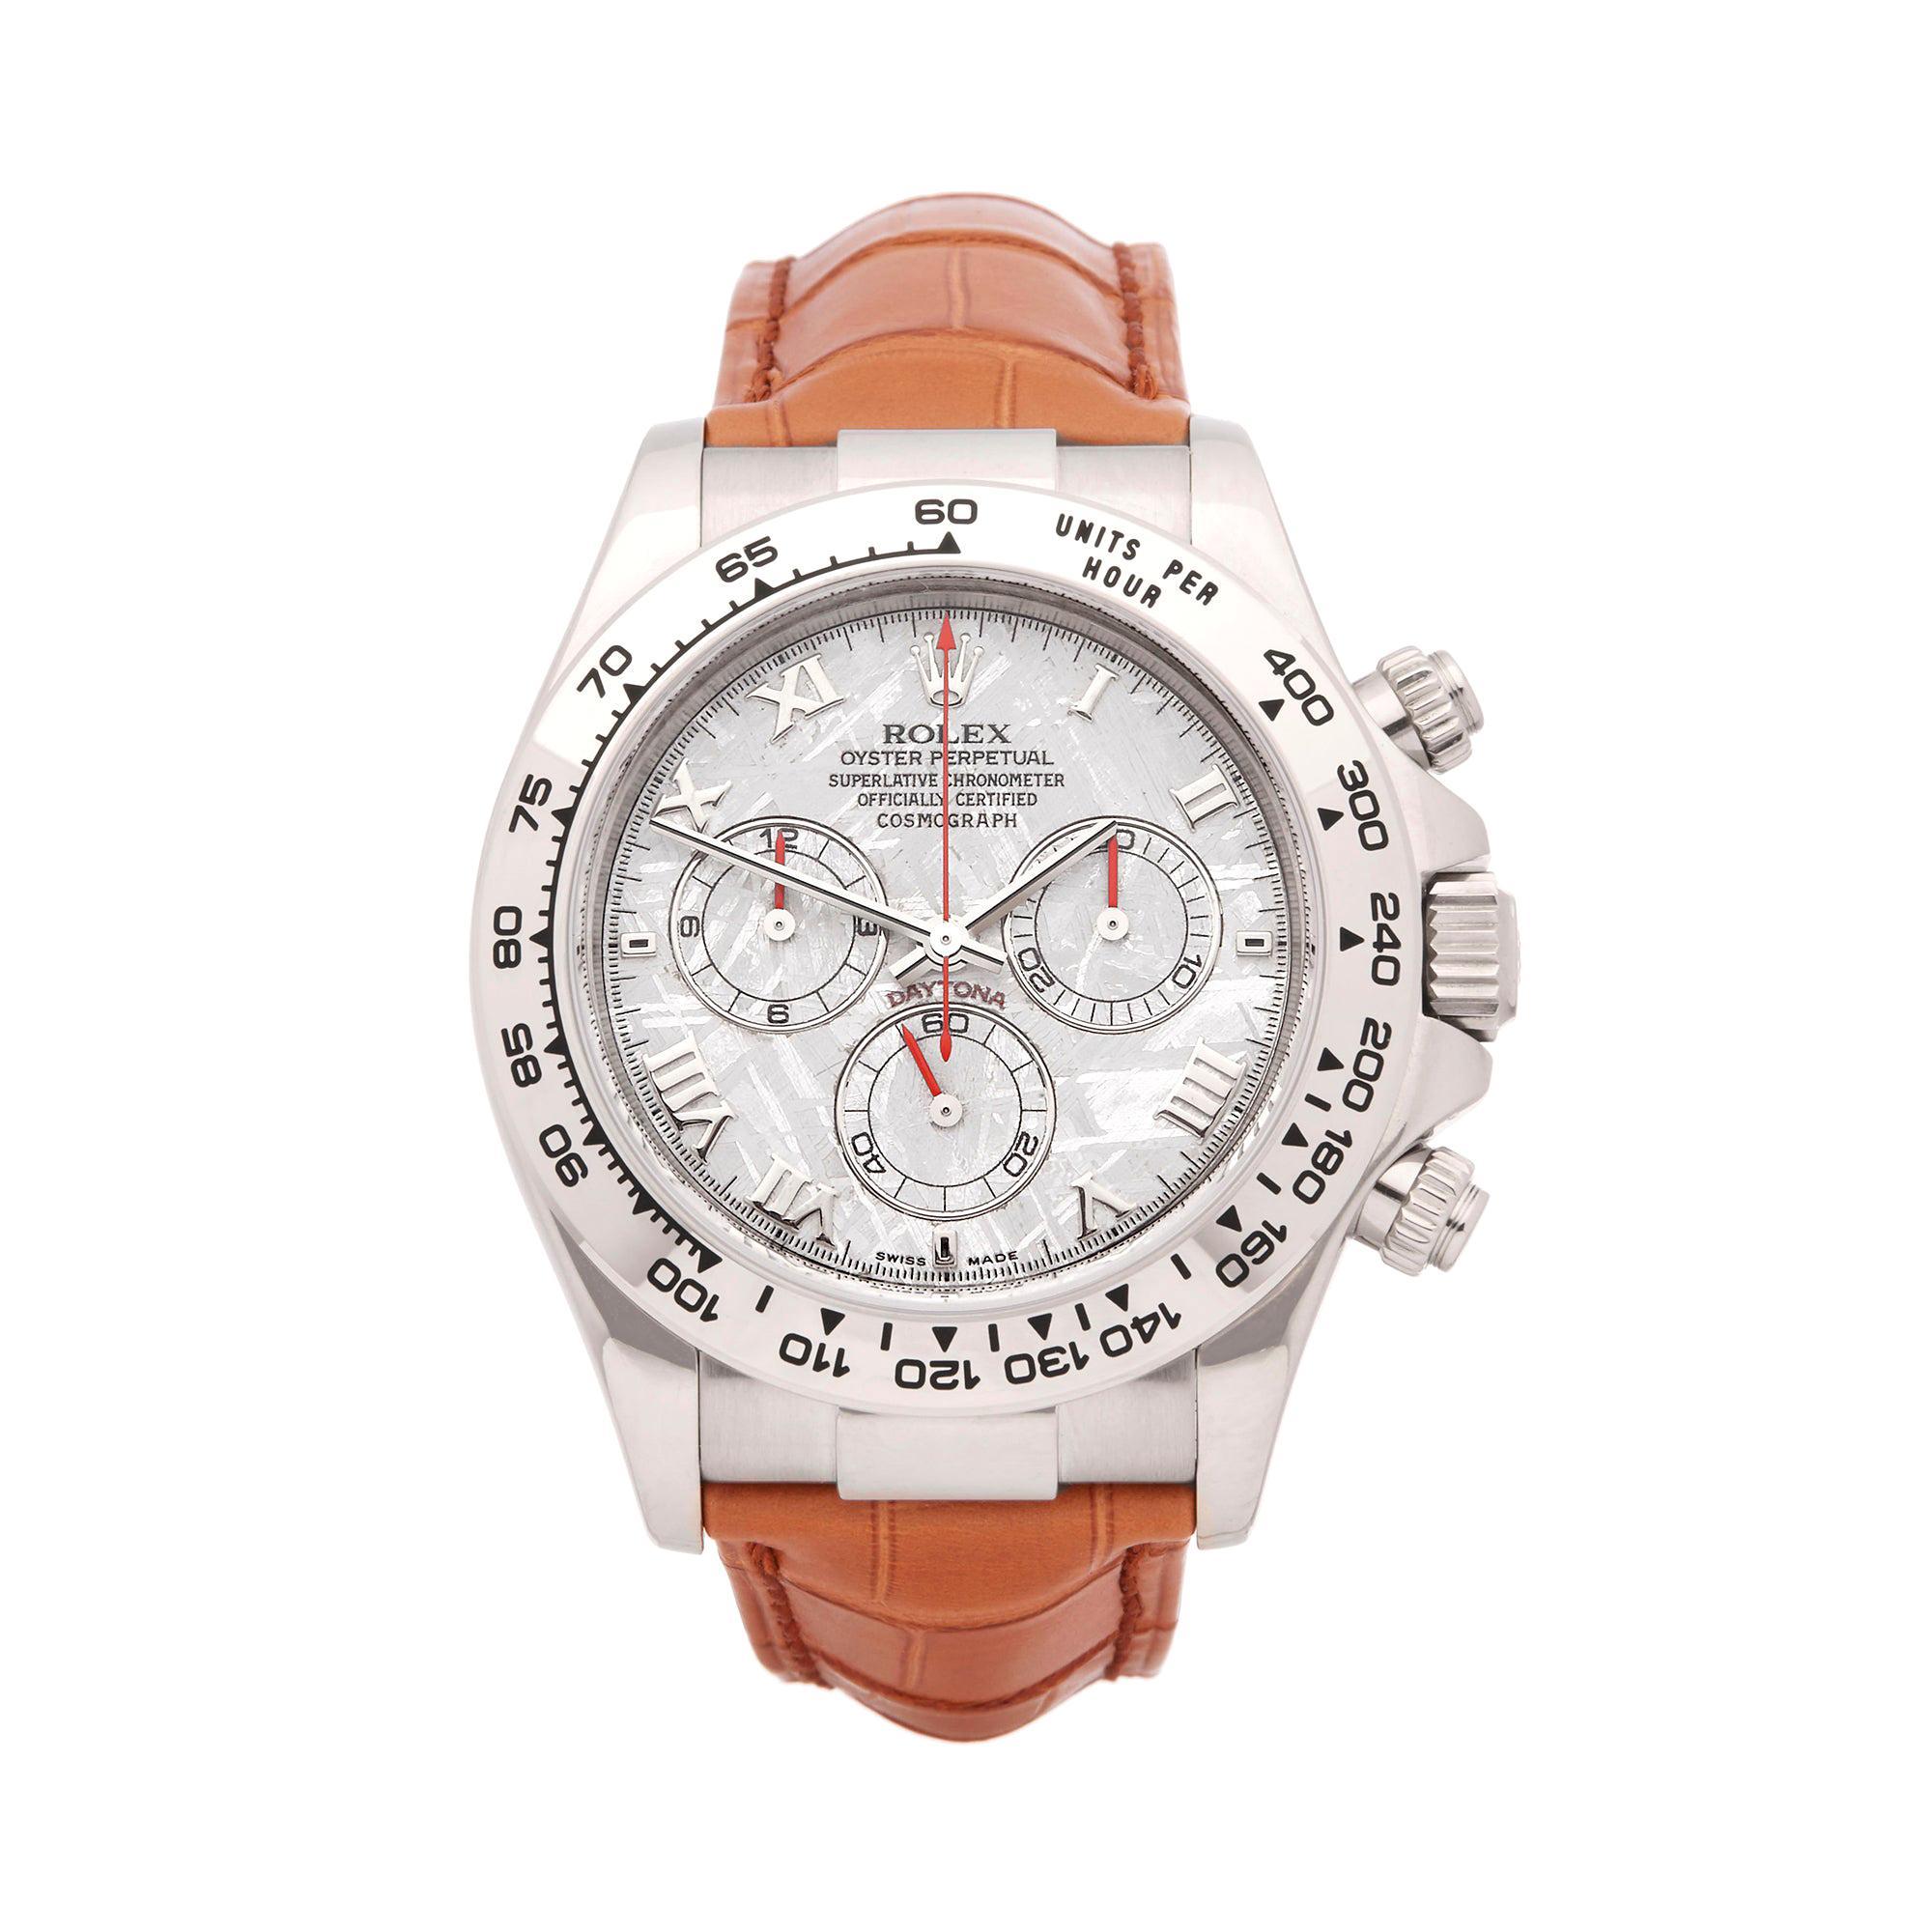 Rolex White Gold Cosmograph Meteorite Dial Daytona Wristwatch Ref